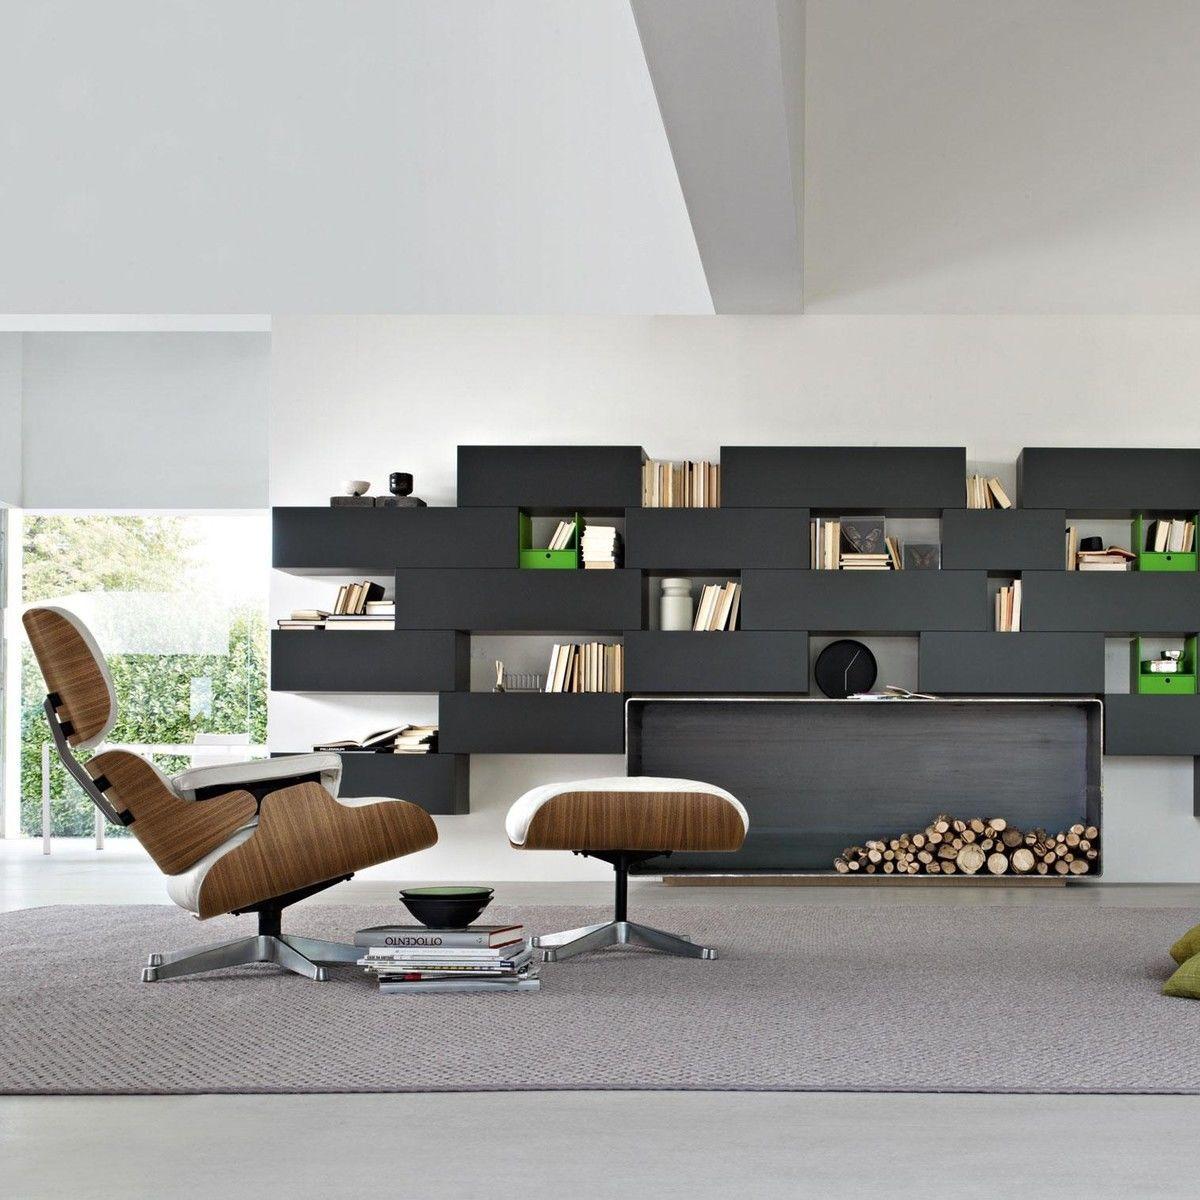 vitra eames lounge chair xl neue mae ottoman - Eames Lounge Stuhl Abmessungen